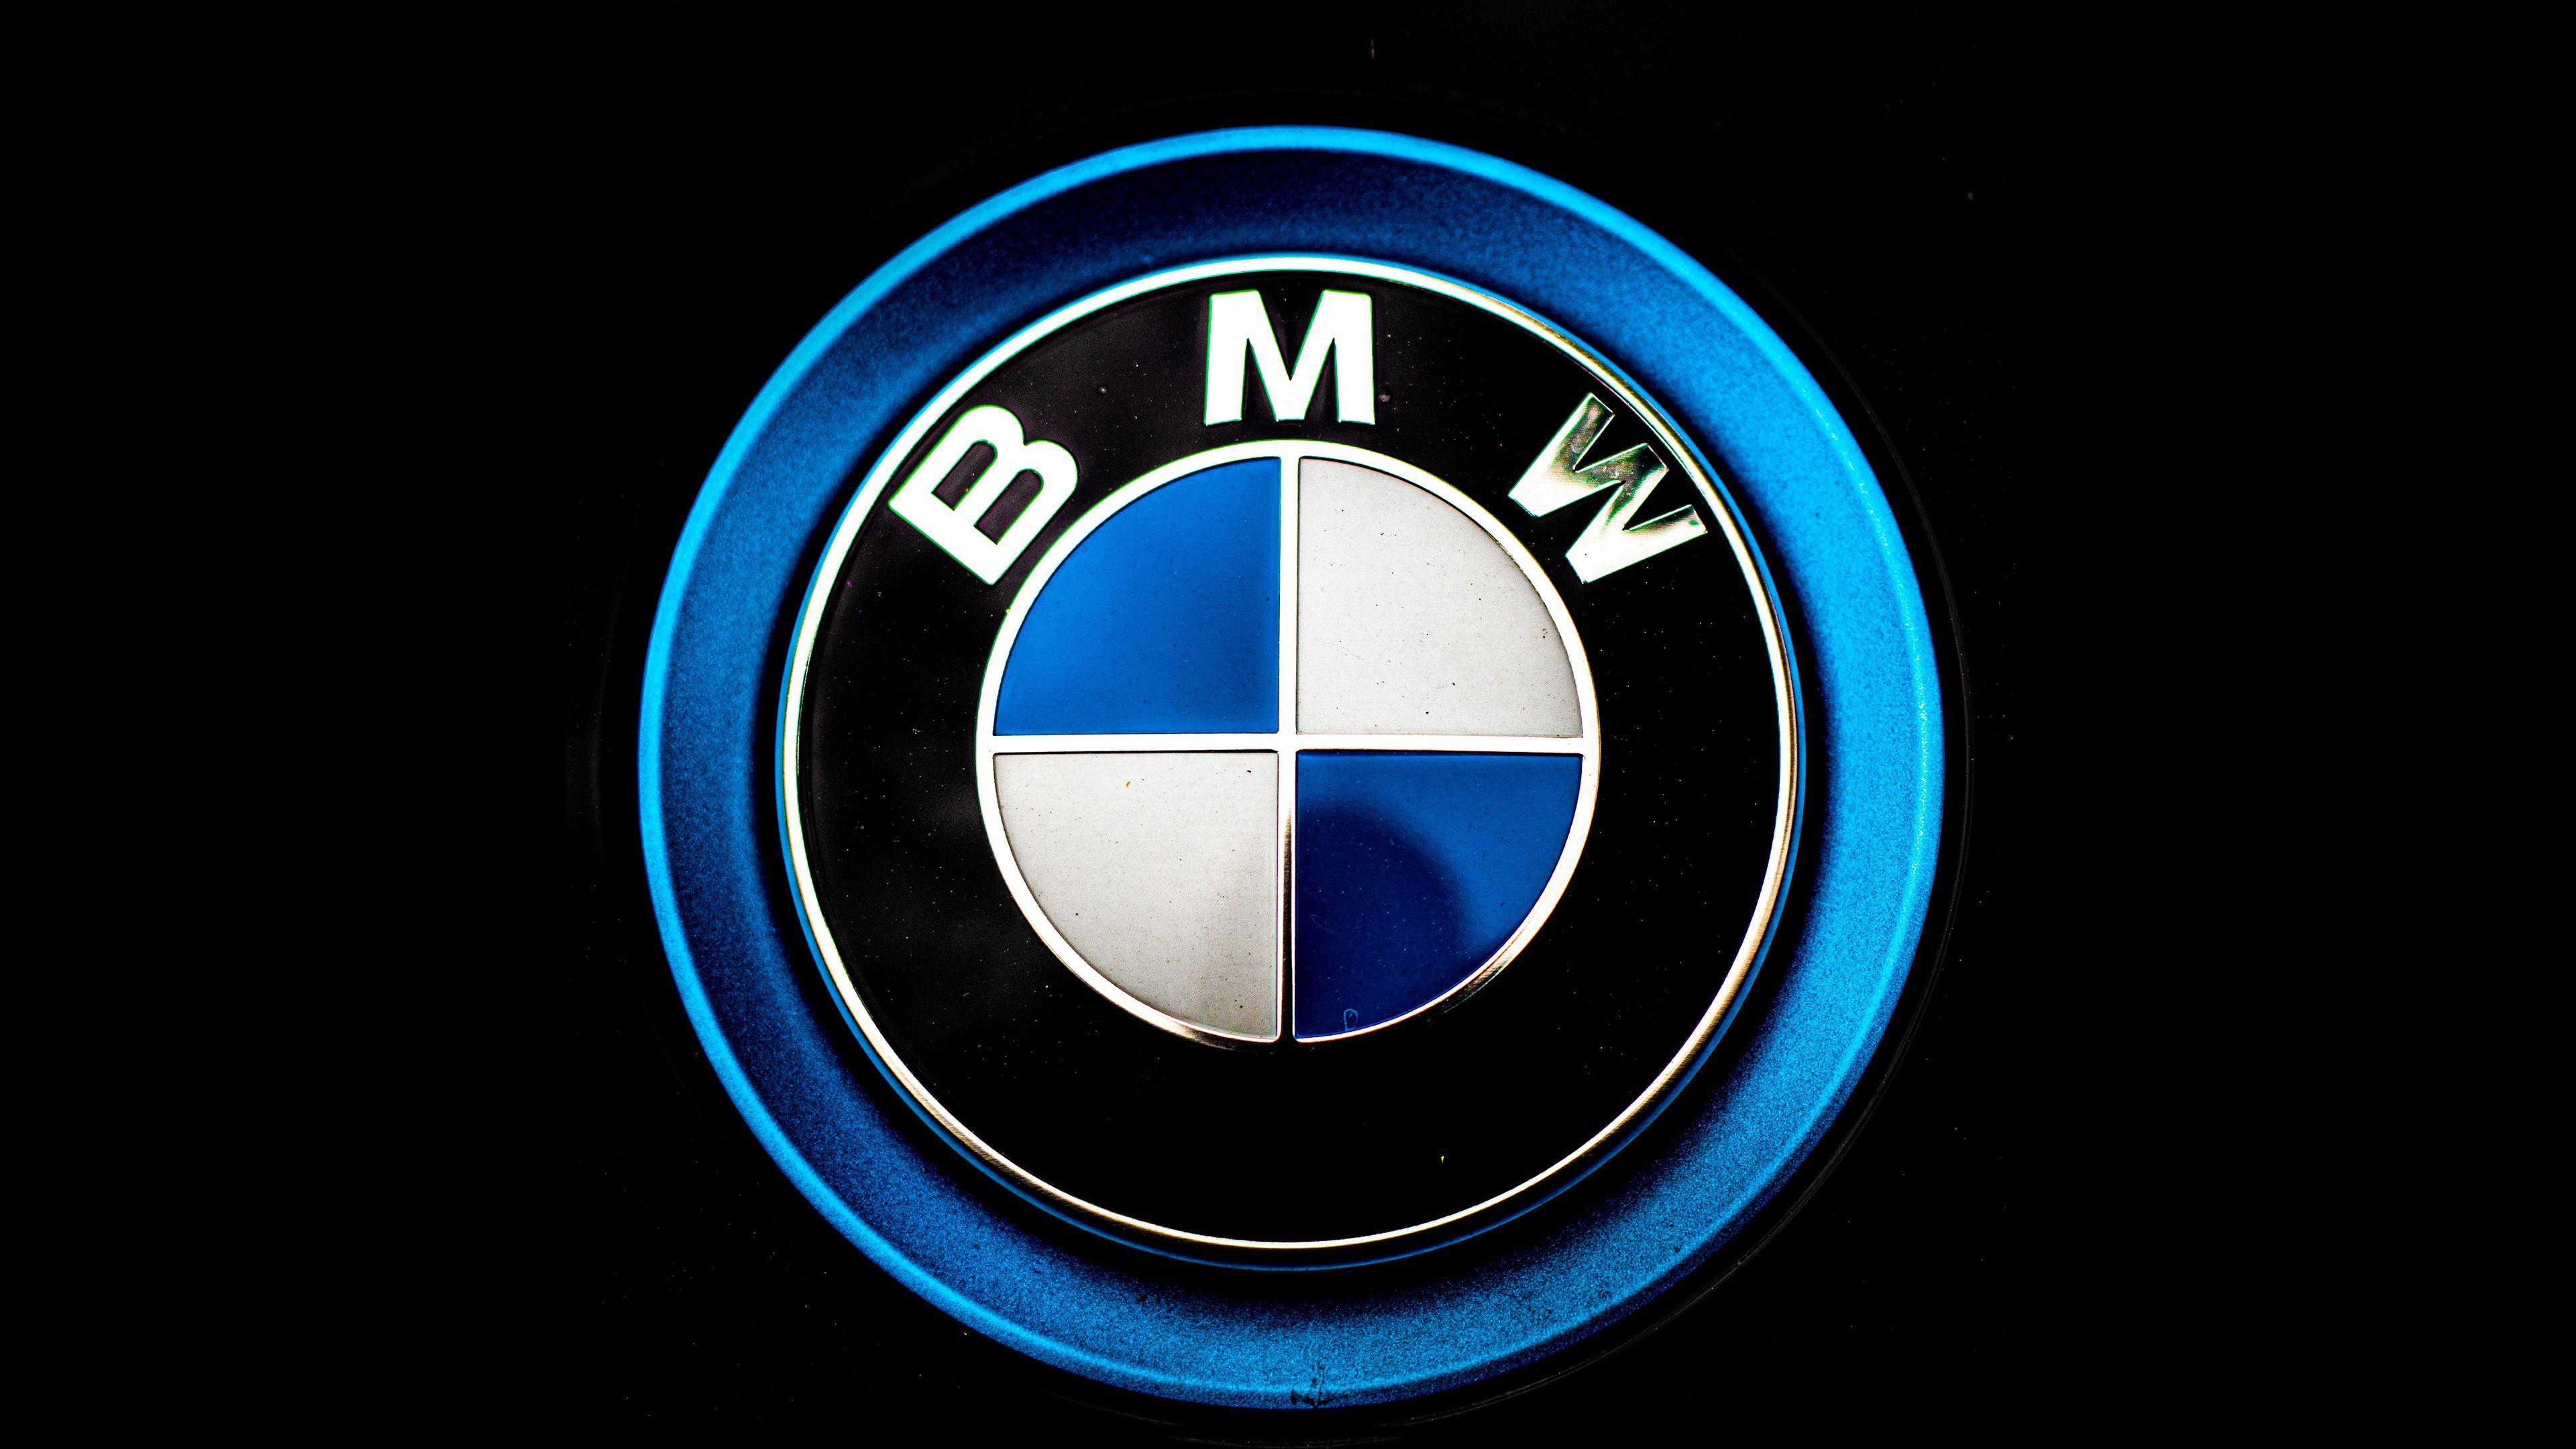 лучшие фото логотипа бмв скажу